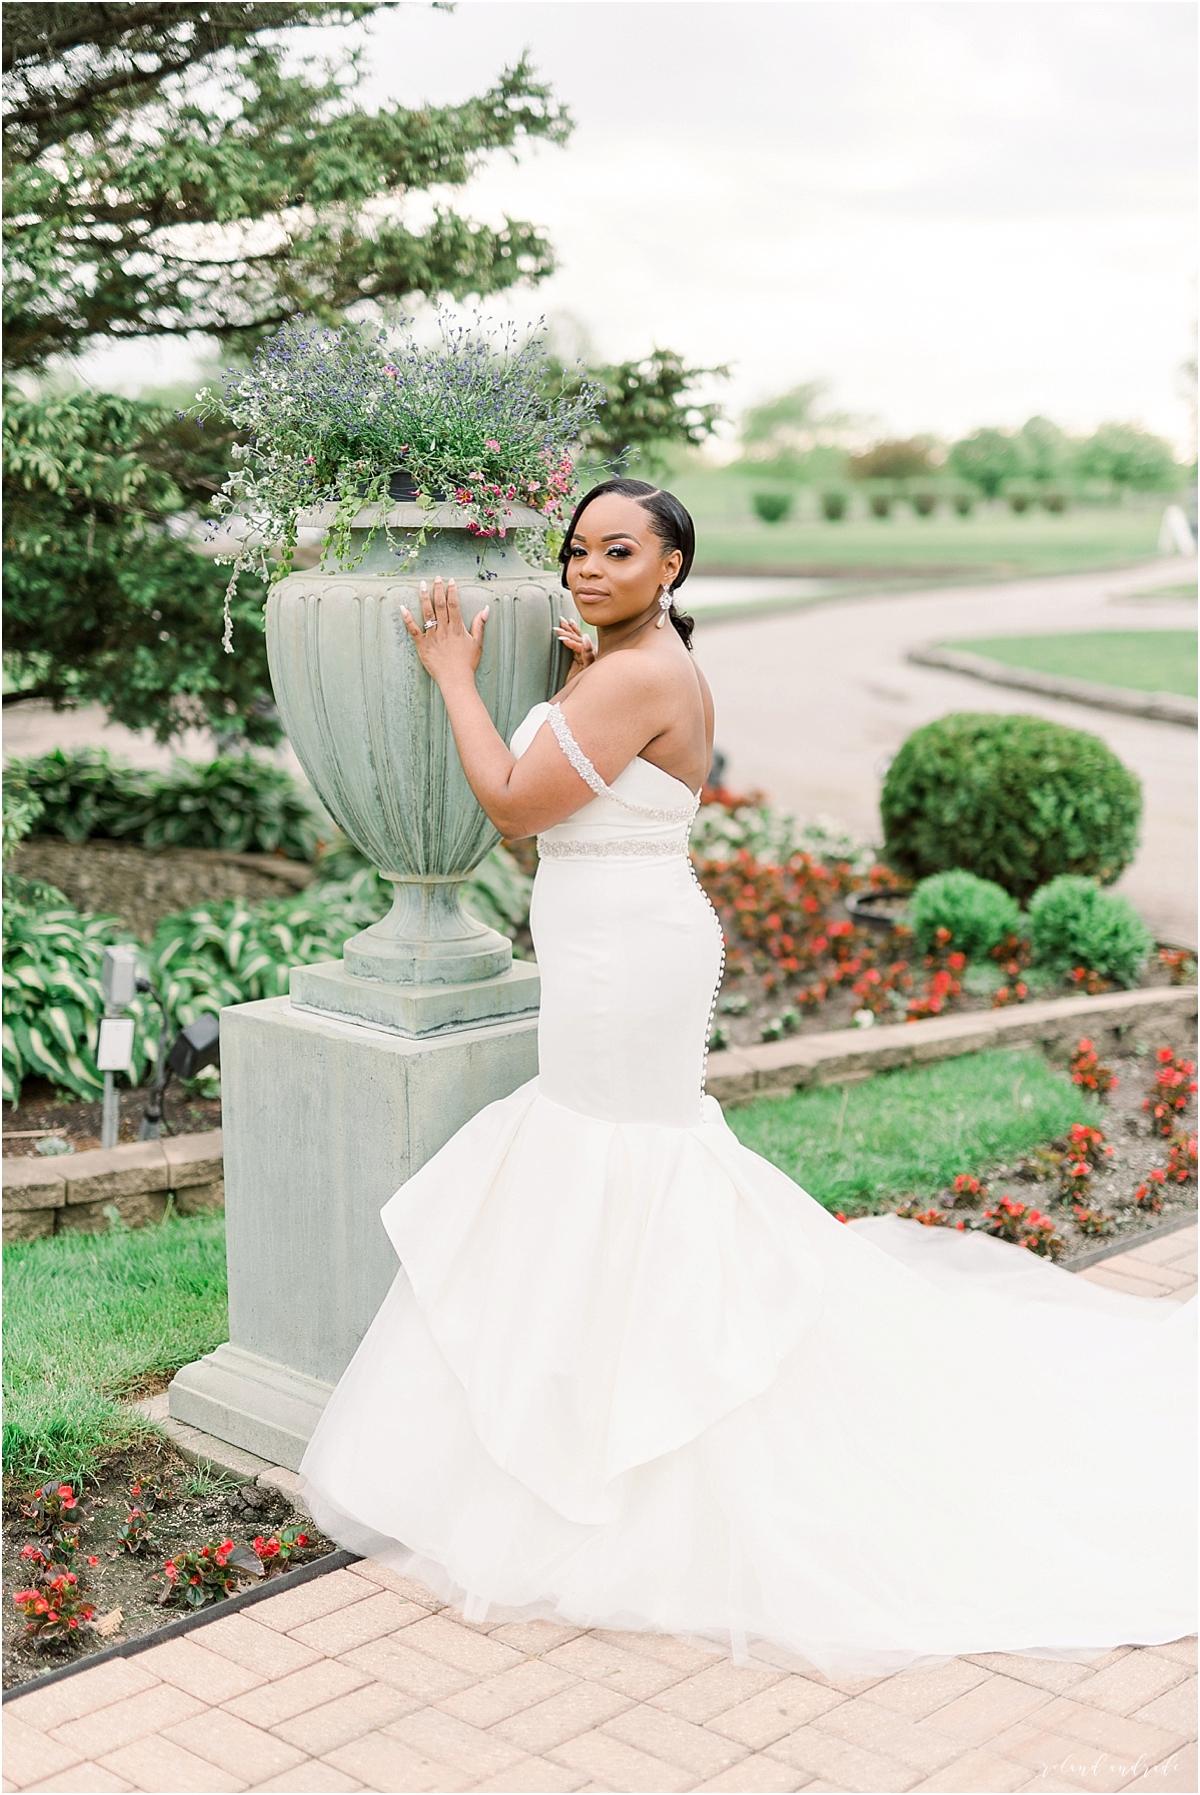 The Odyssey Wedding, Tinley Park Wedding, Chicago Wedding Photographer, Best Photographer In Tineley Park, Best Photographer In Chicago, Light And Airy Photographer_0059.jpg